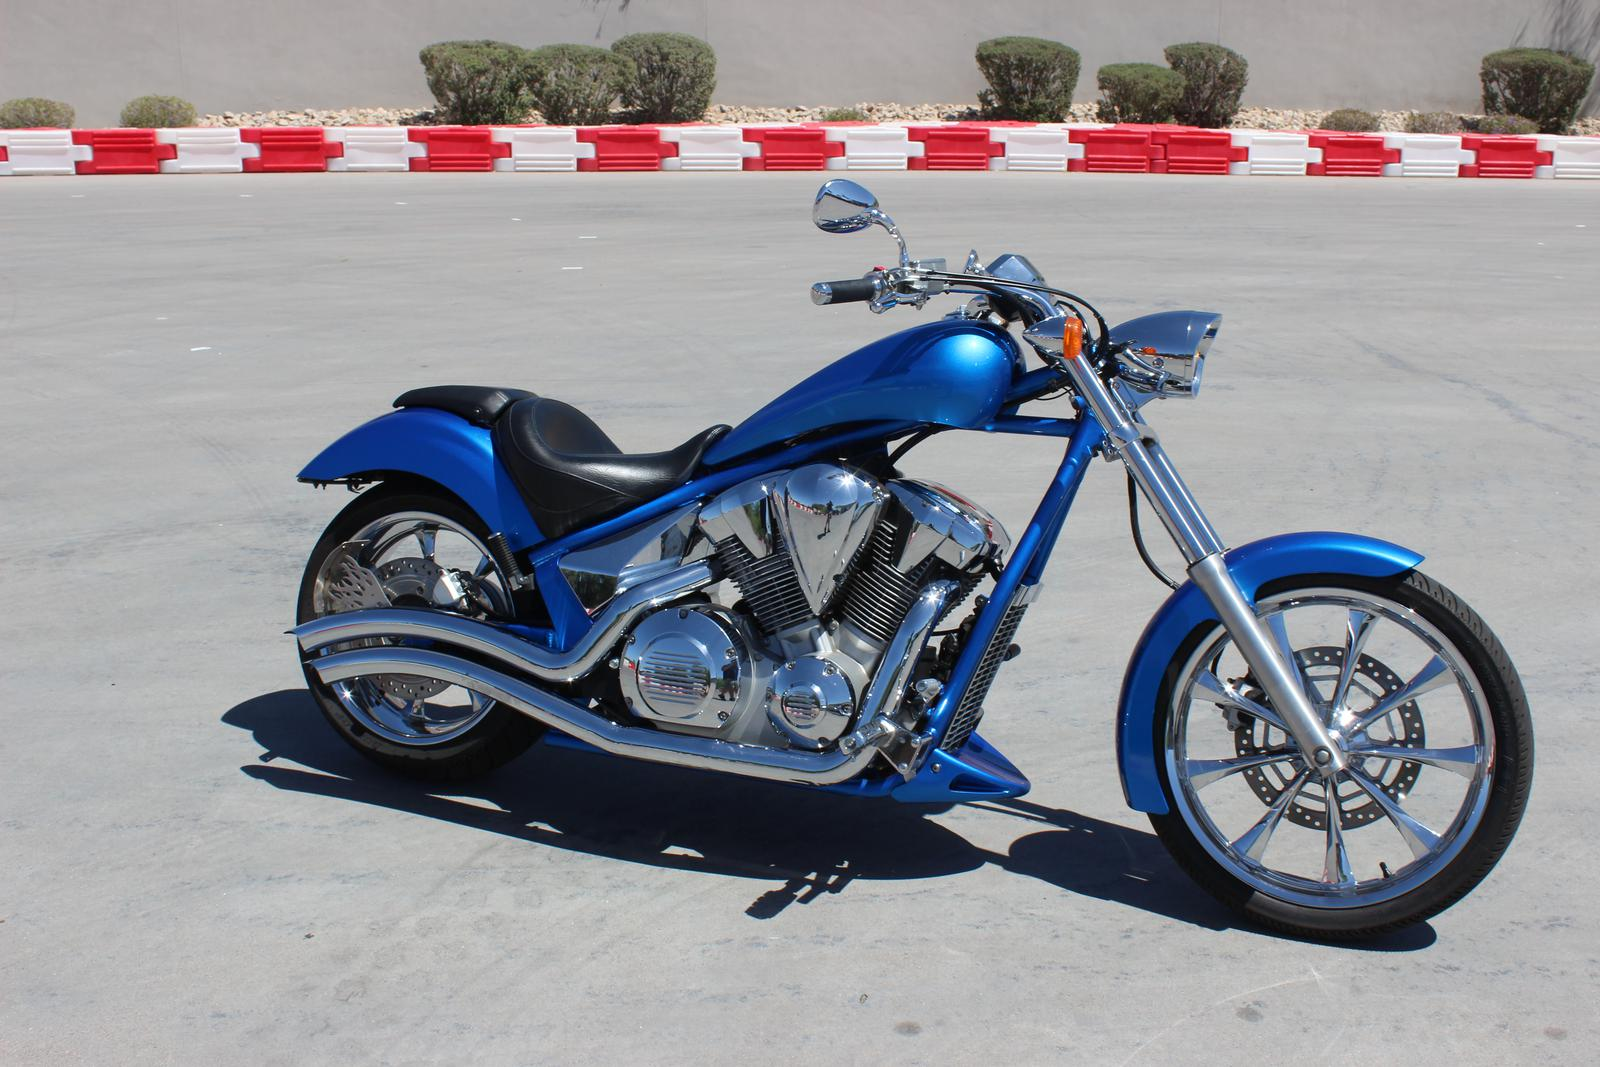 2010 Honda Fury for sale in Scottsdale, AZ | GO AZ Motorcycles in ...